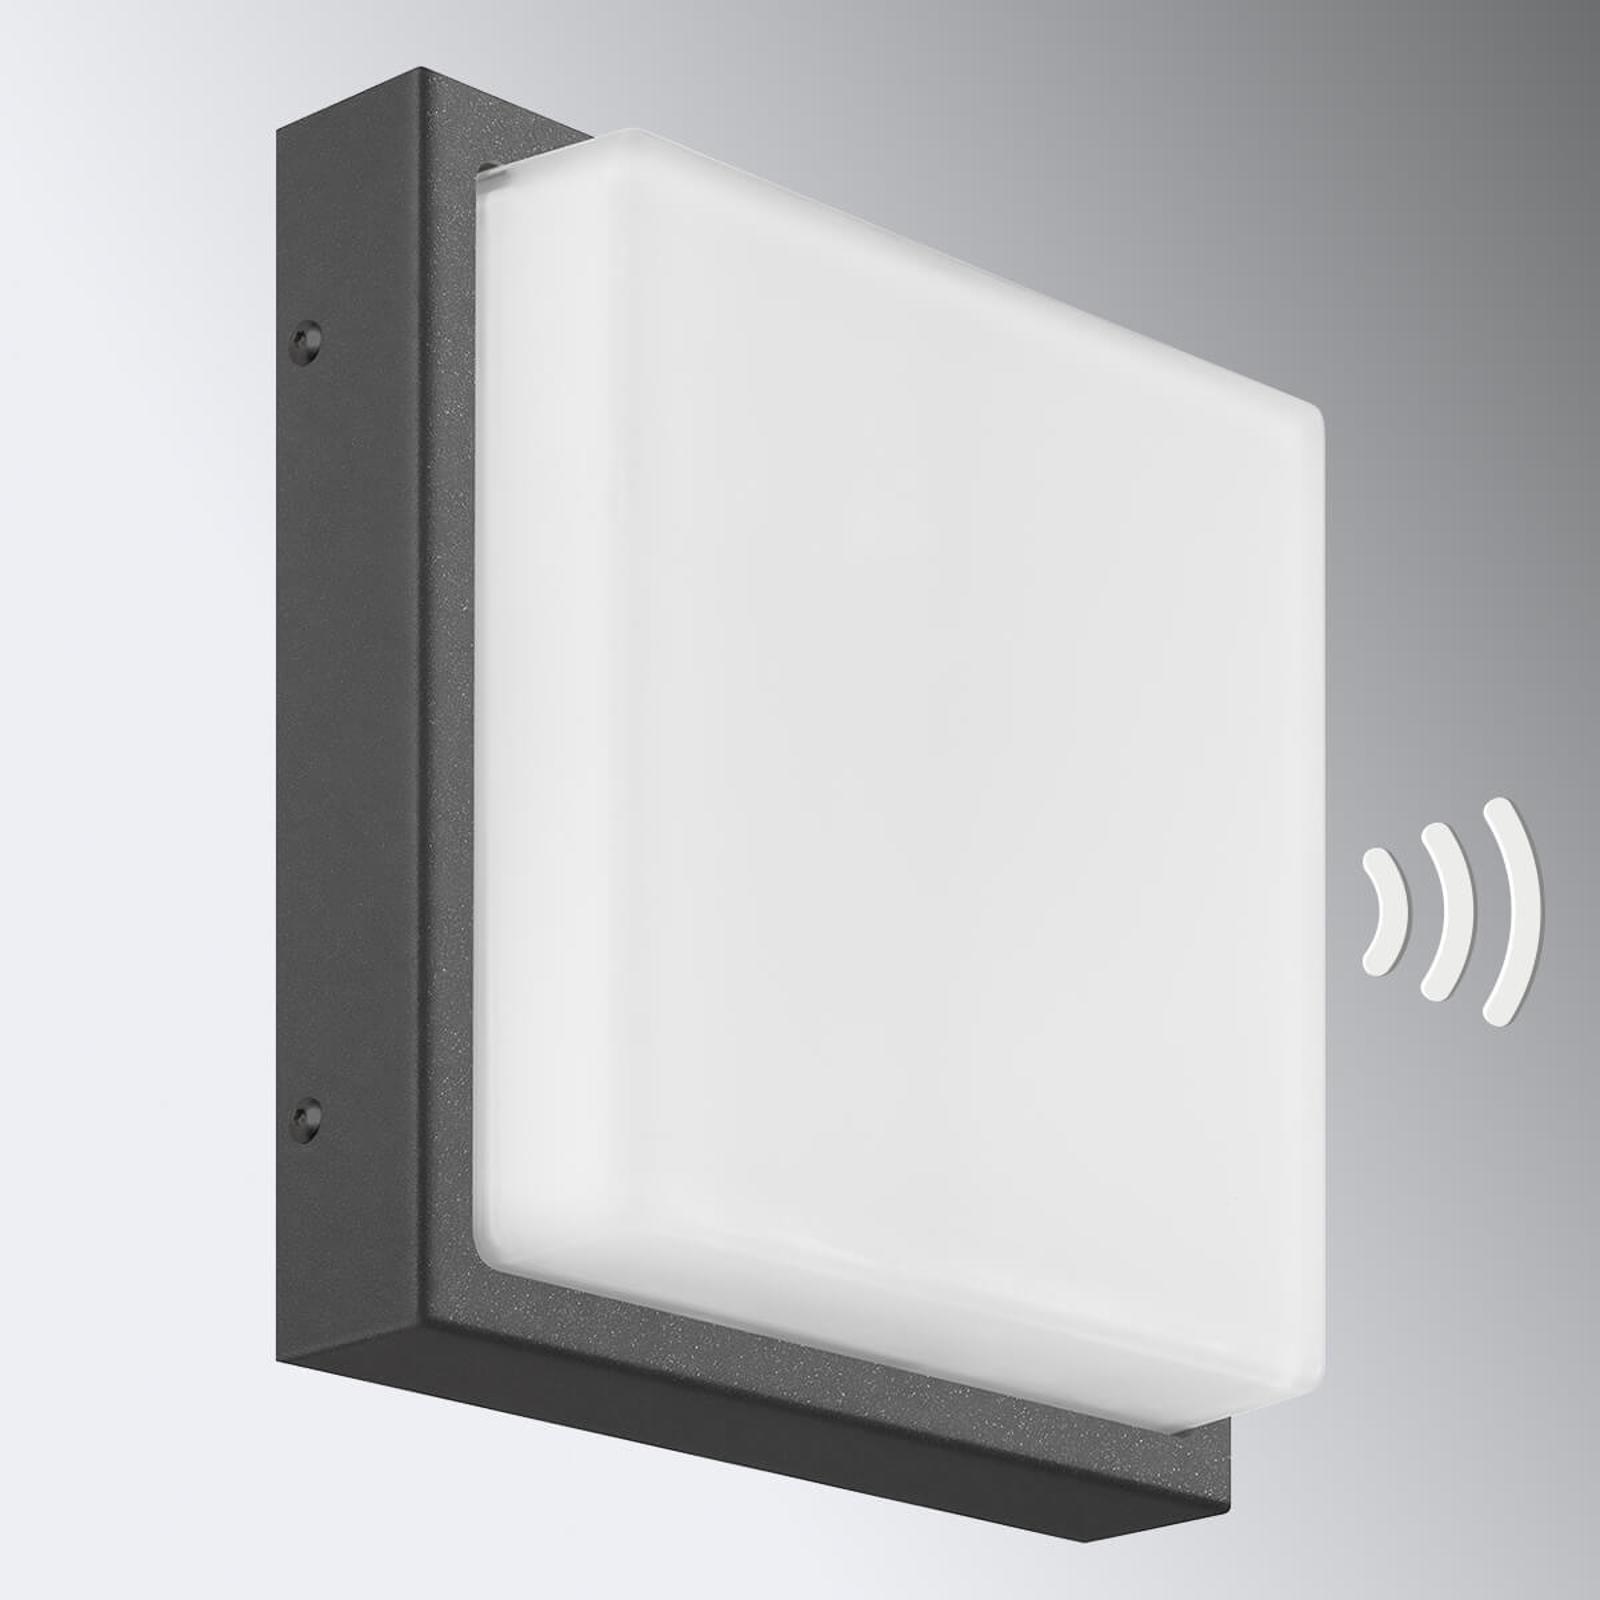 Vägglampa Ernest E27 med rörelsesensor grafit